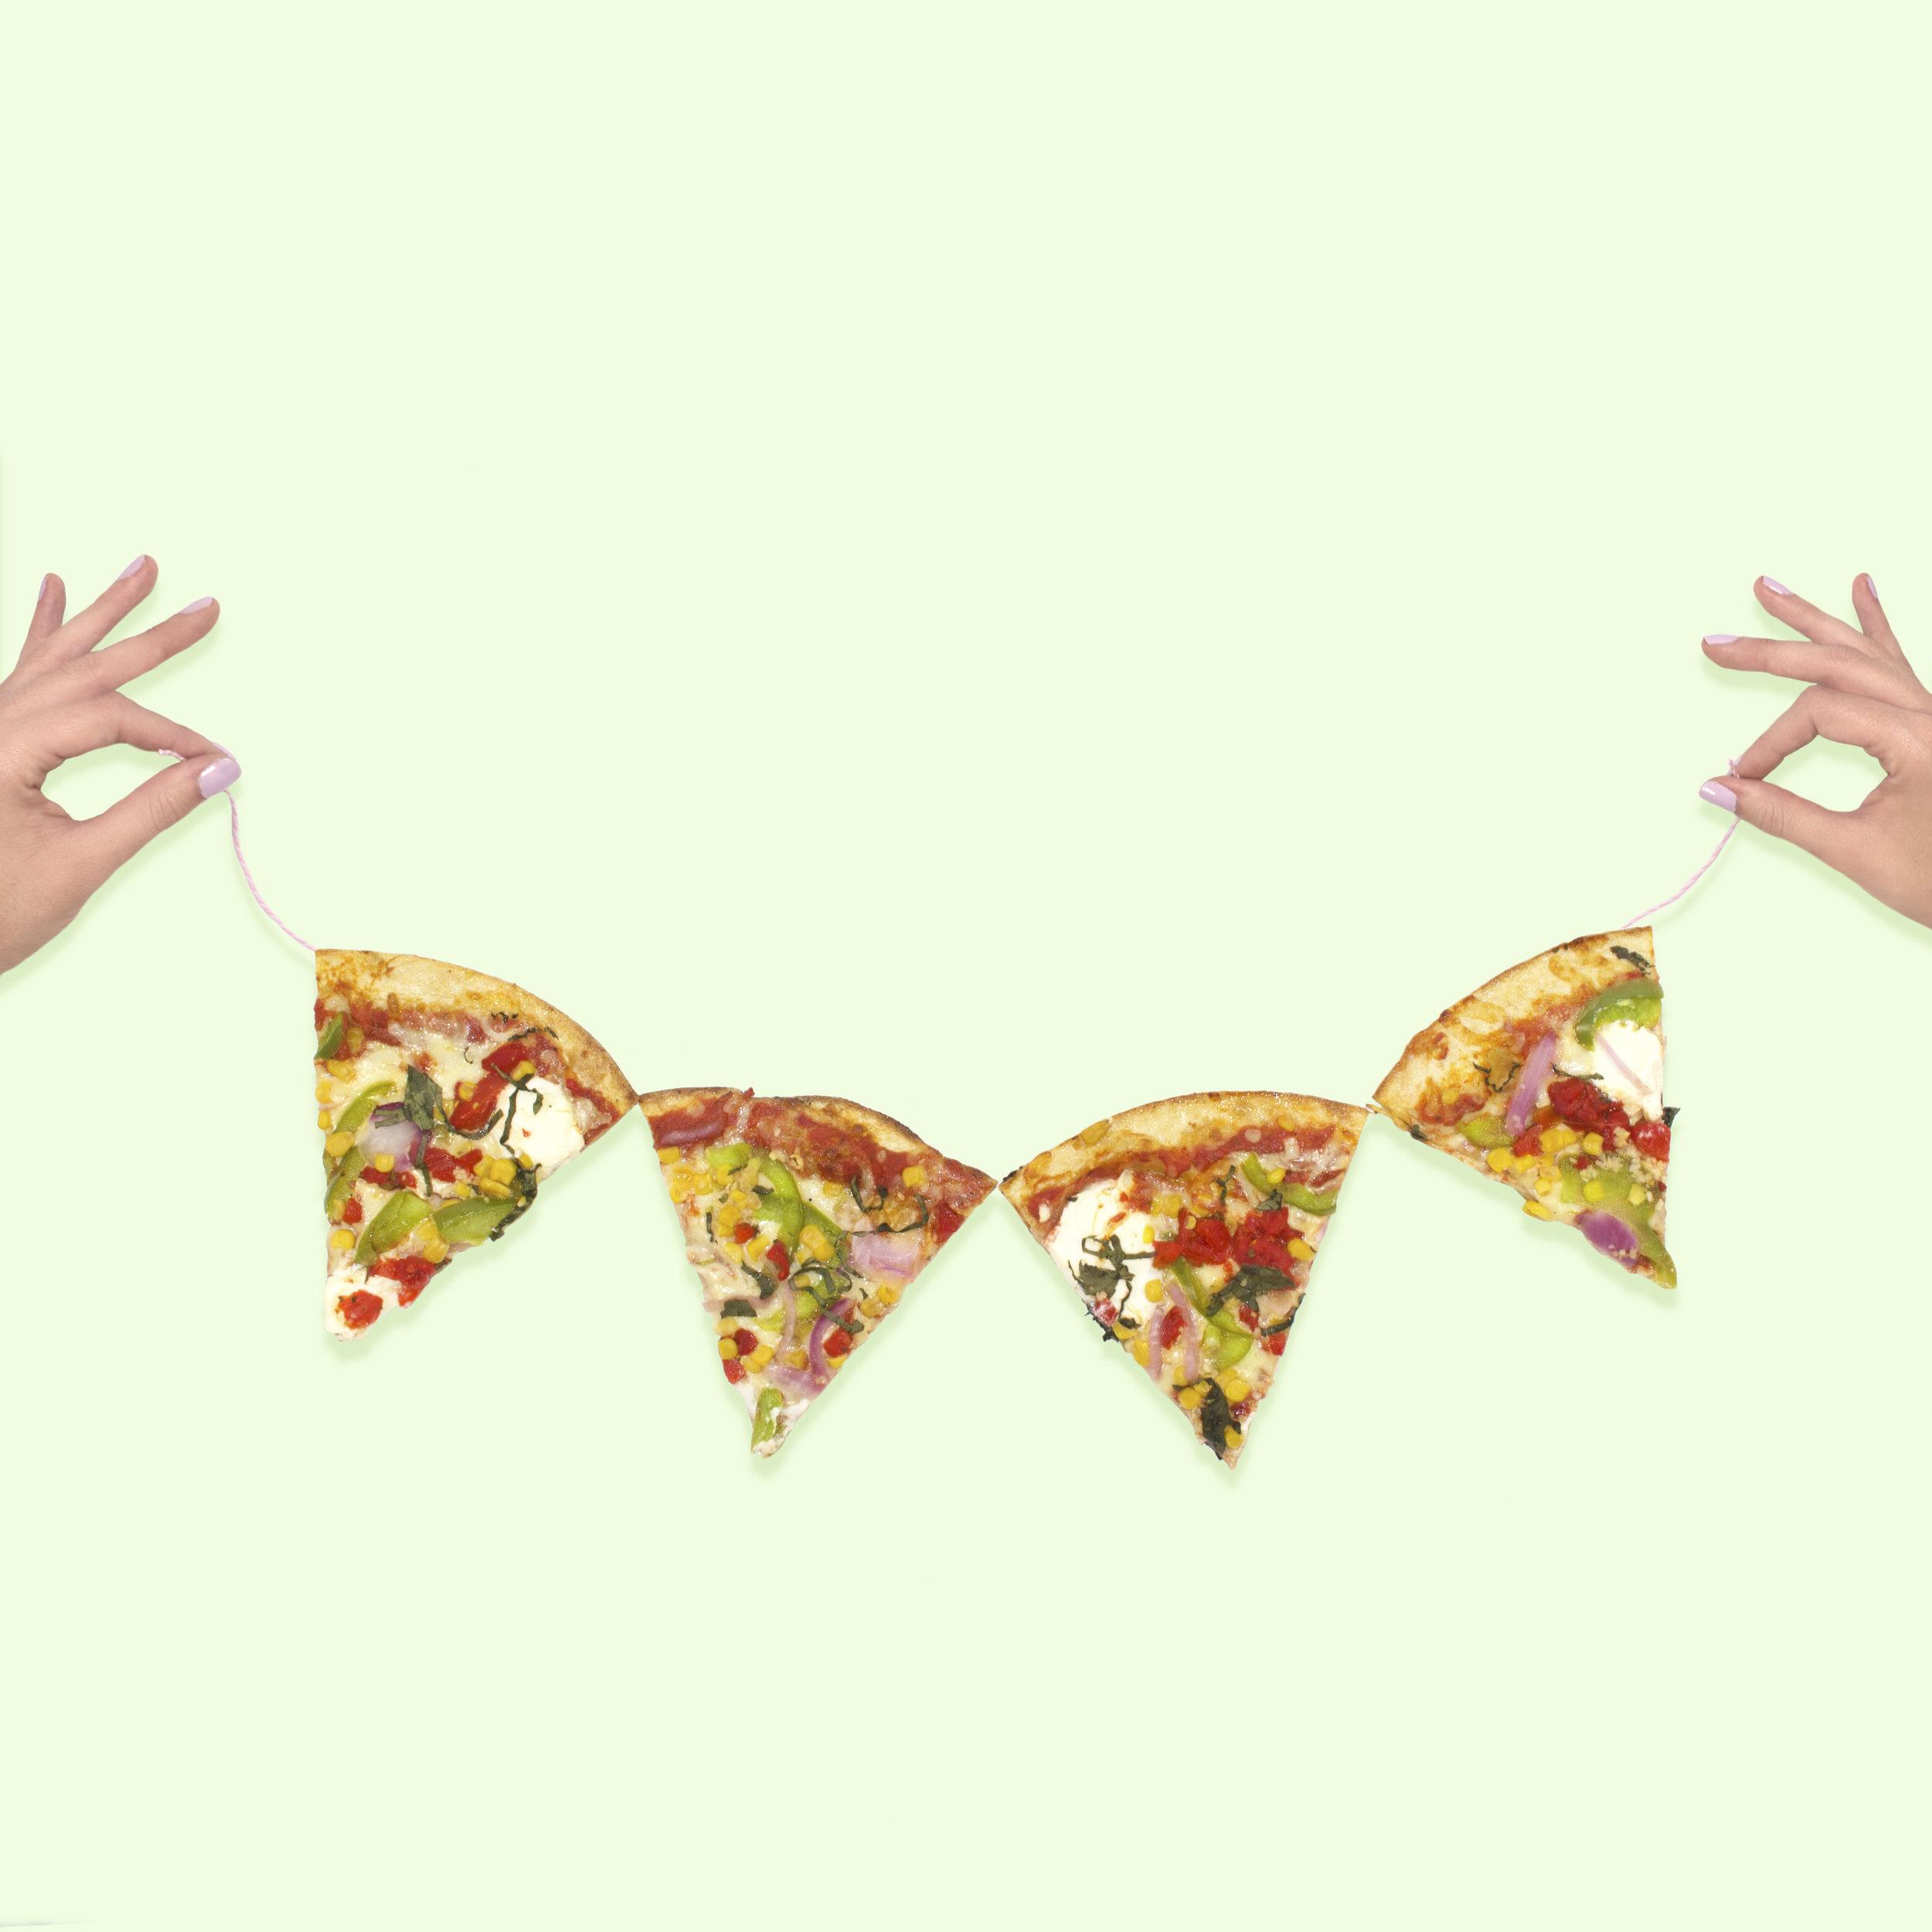 pieology-pizza-banner.jpg